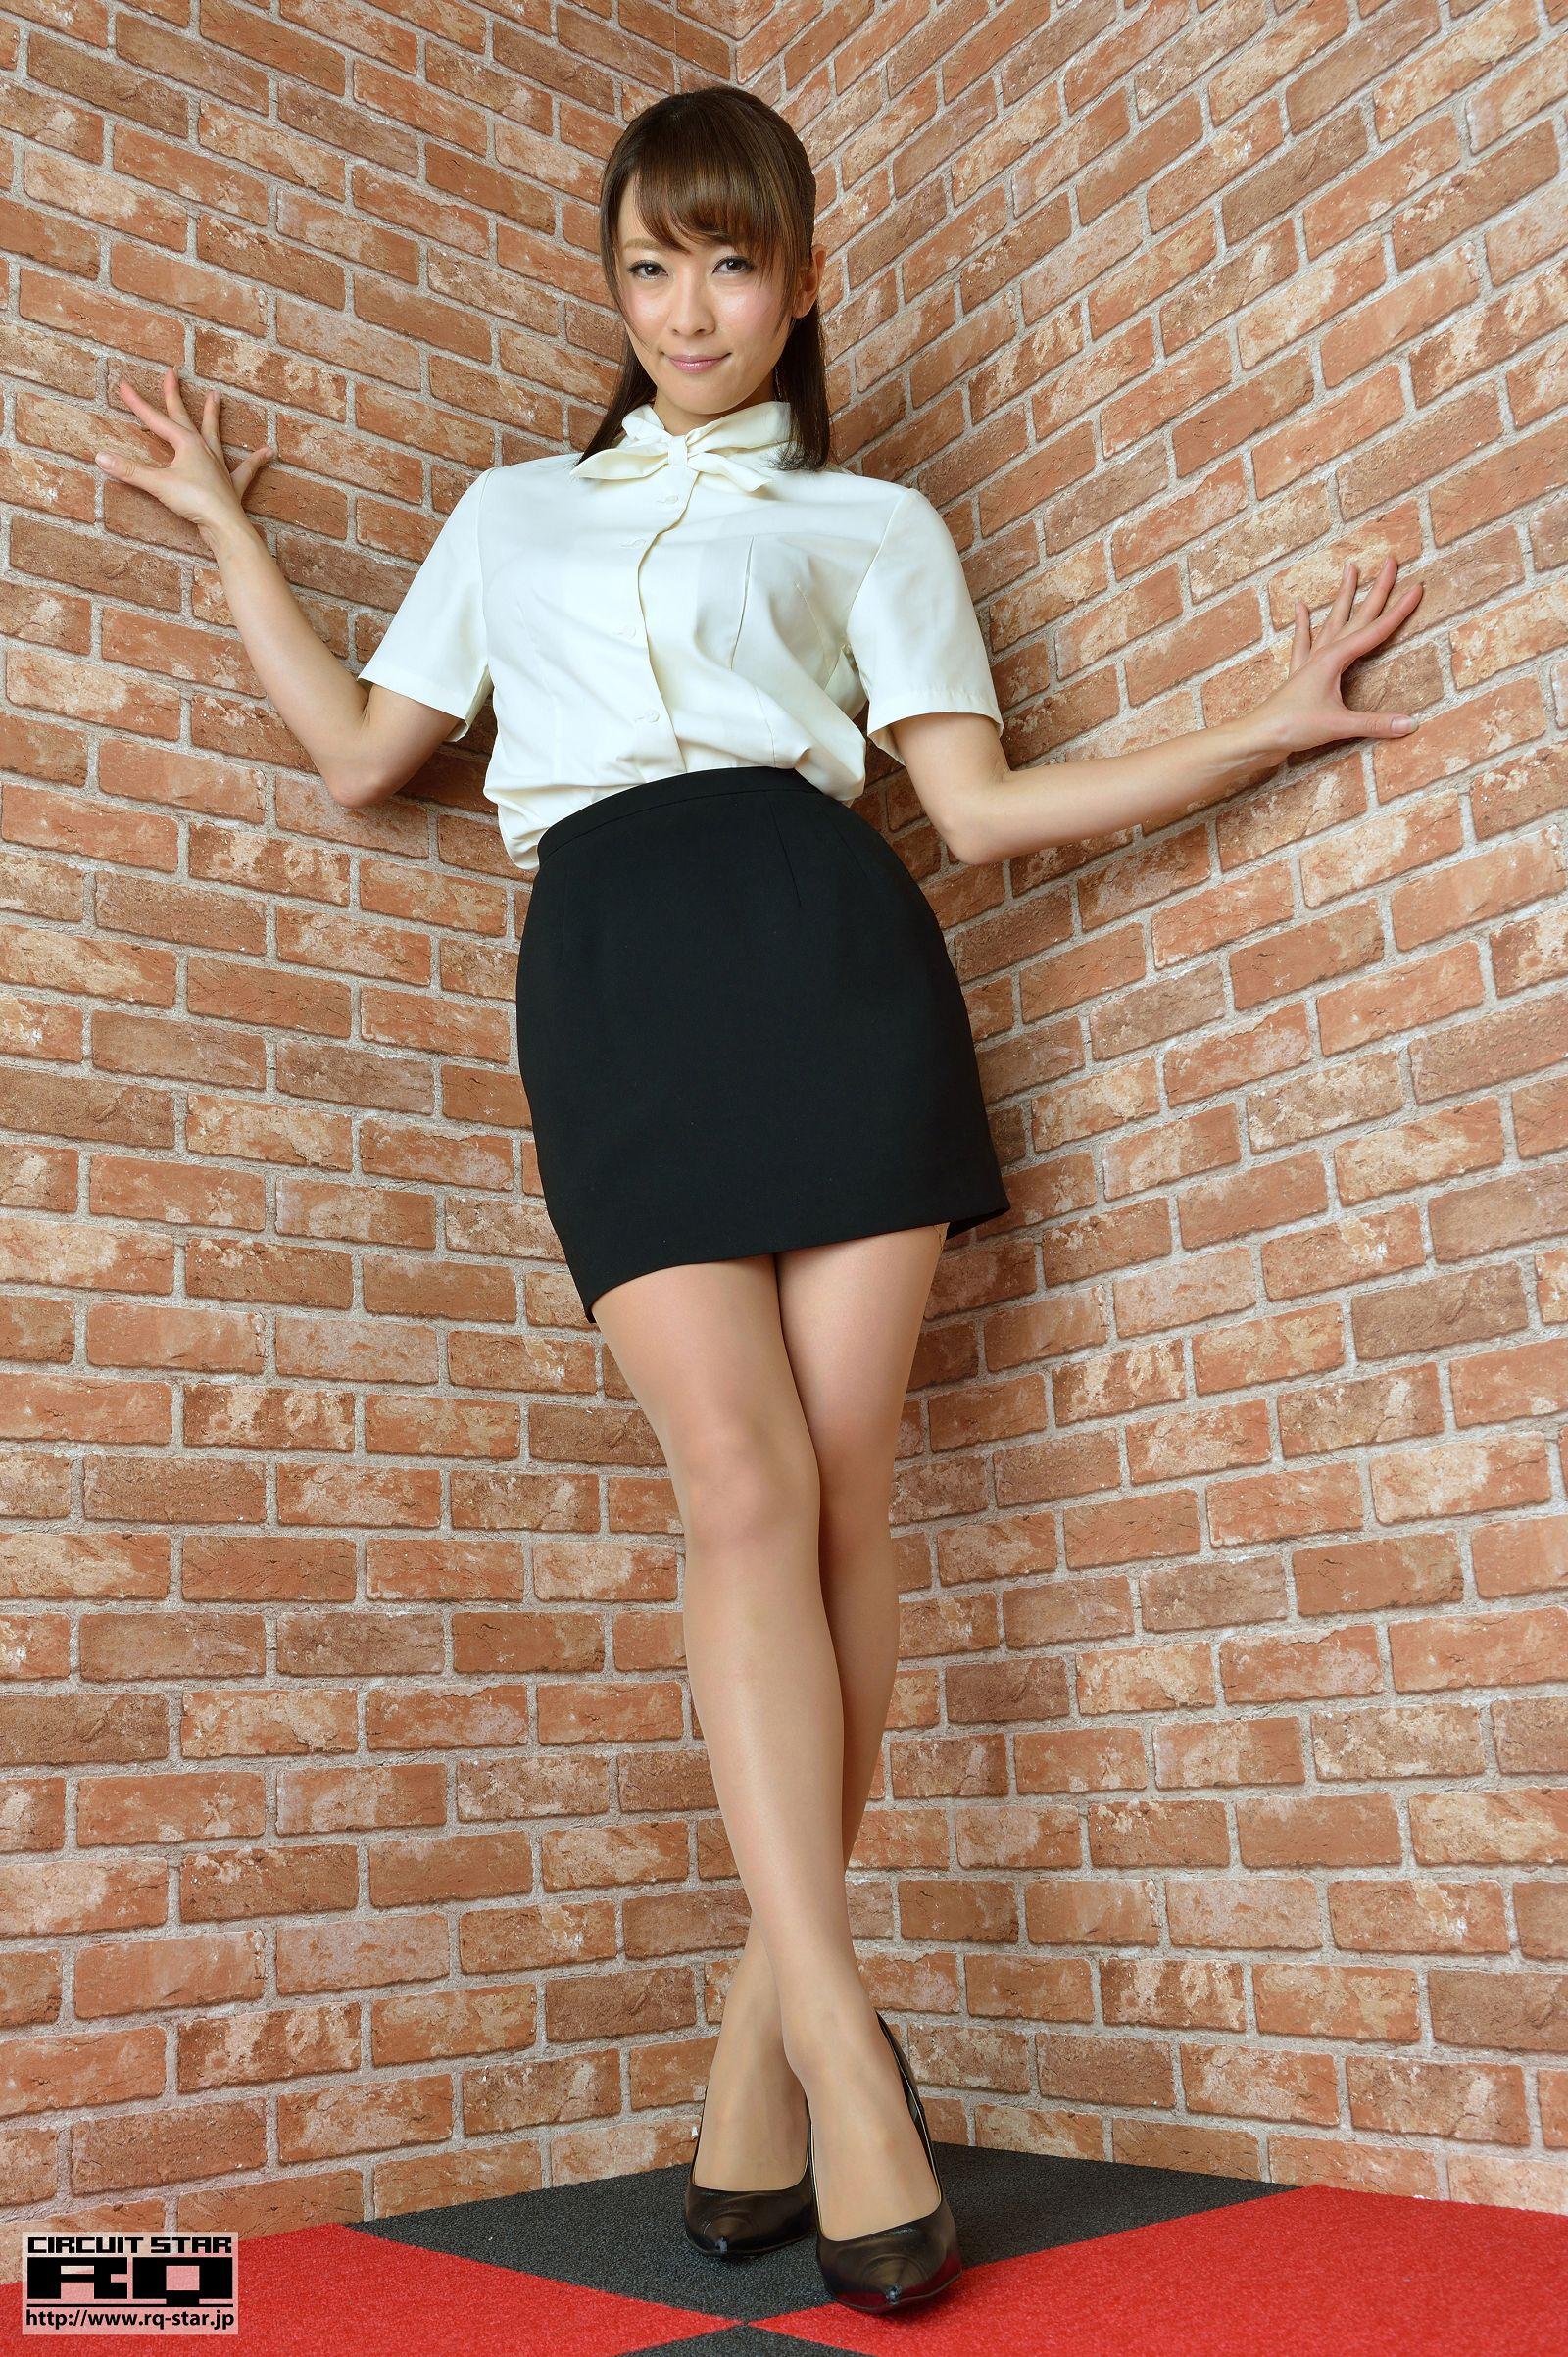 [RQ STAR美女] NO.00762 Tomoka Tsukimura 月村ともか Office Lady[80P] RQ STAR 第1张